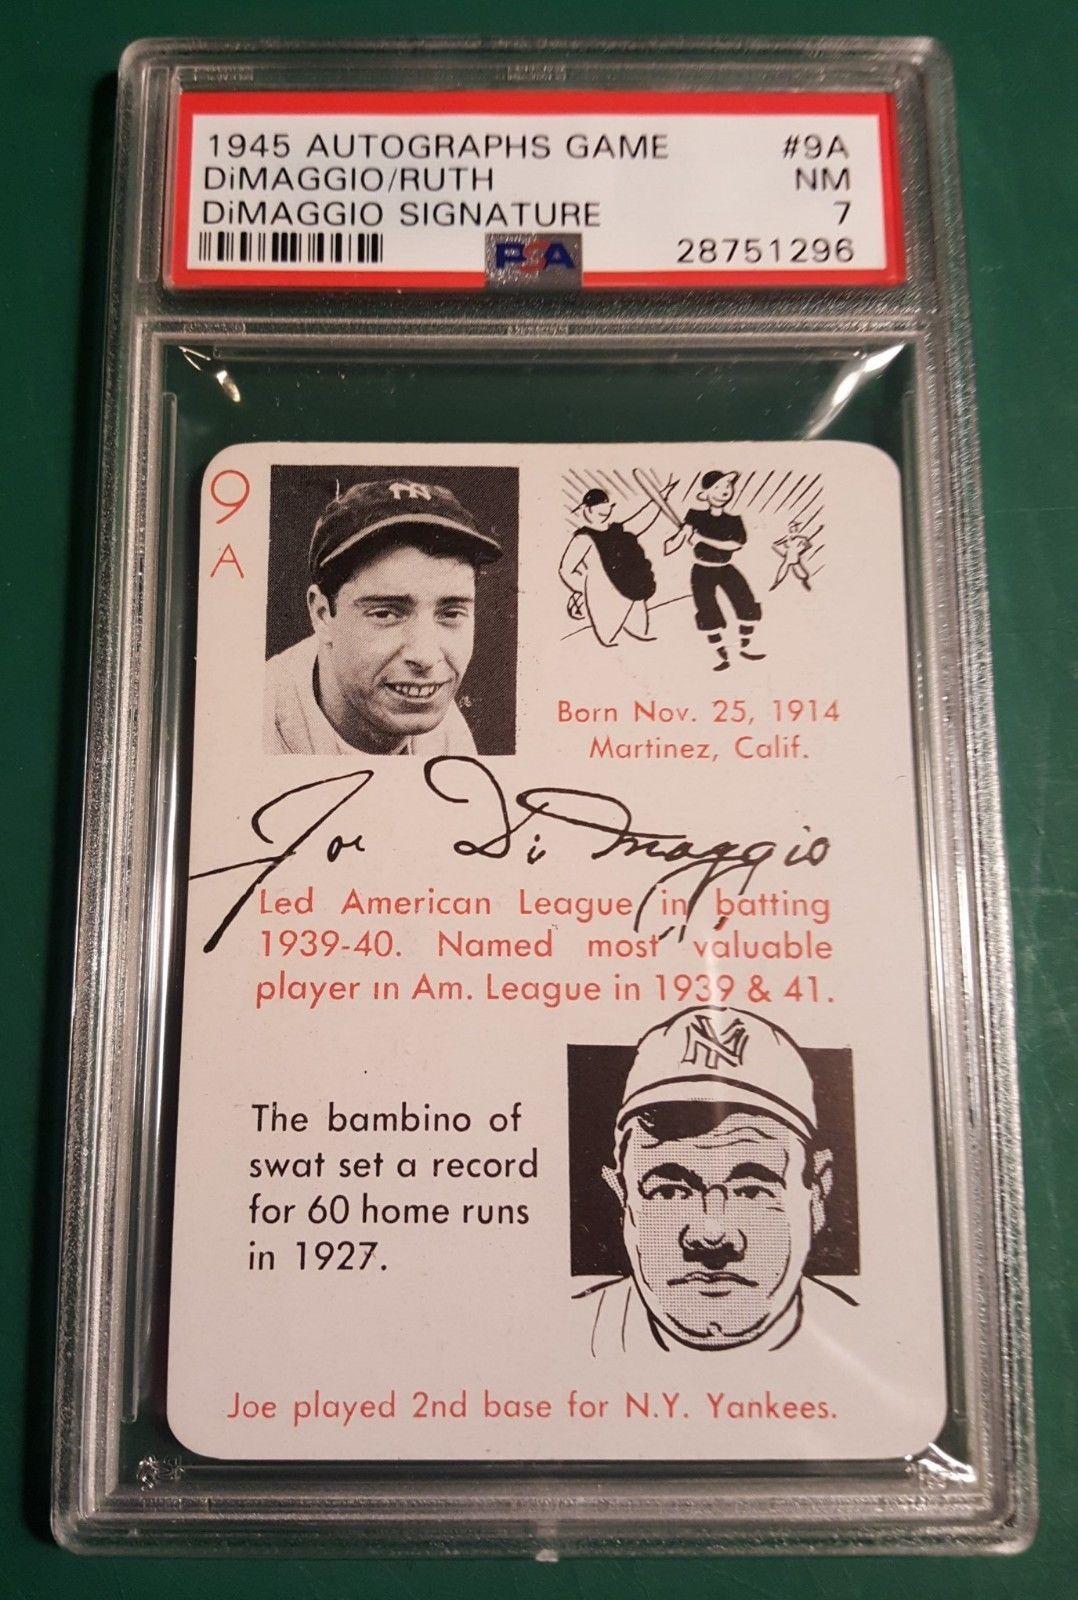 1945 joe dimaggio babe ruth leisters autograph game card